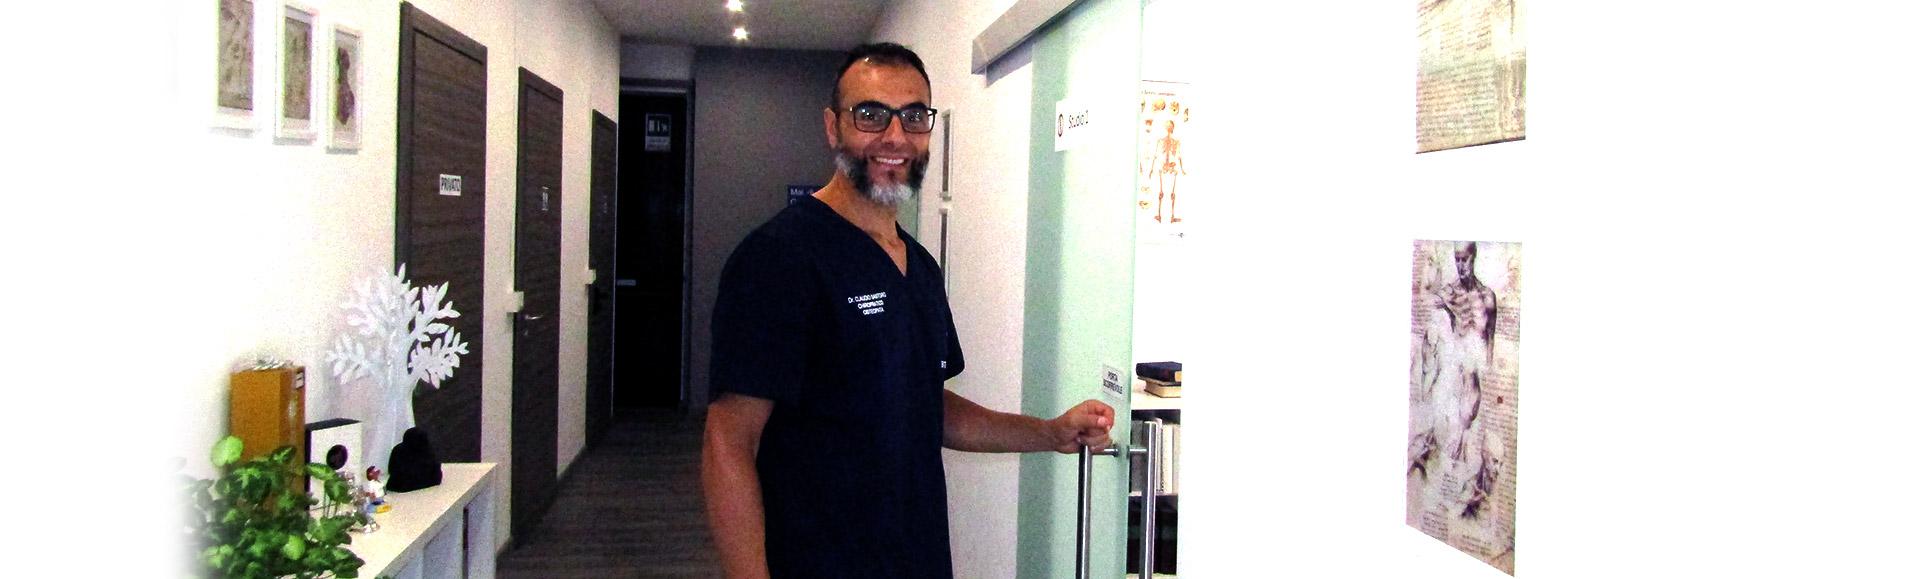 Dott. Claudio Santoro